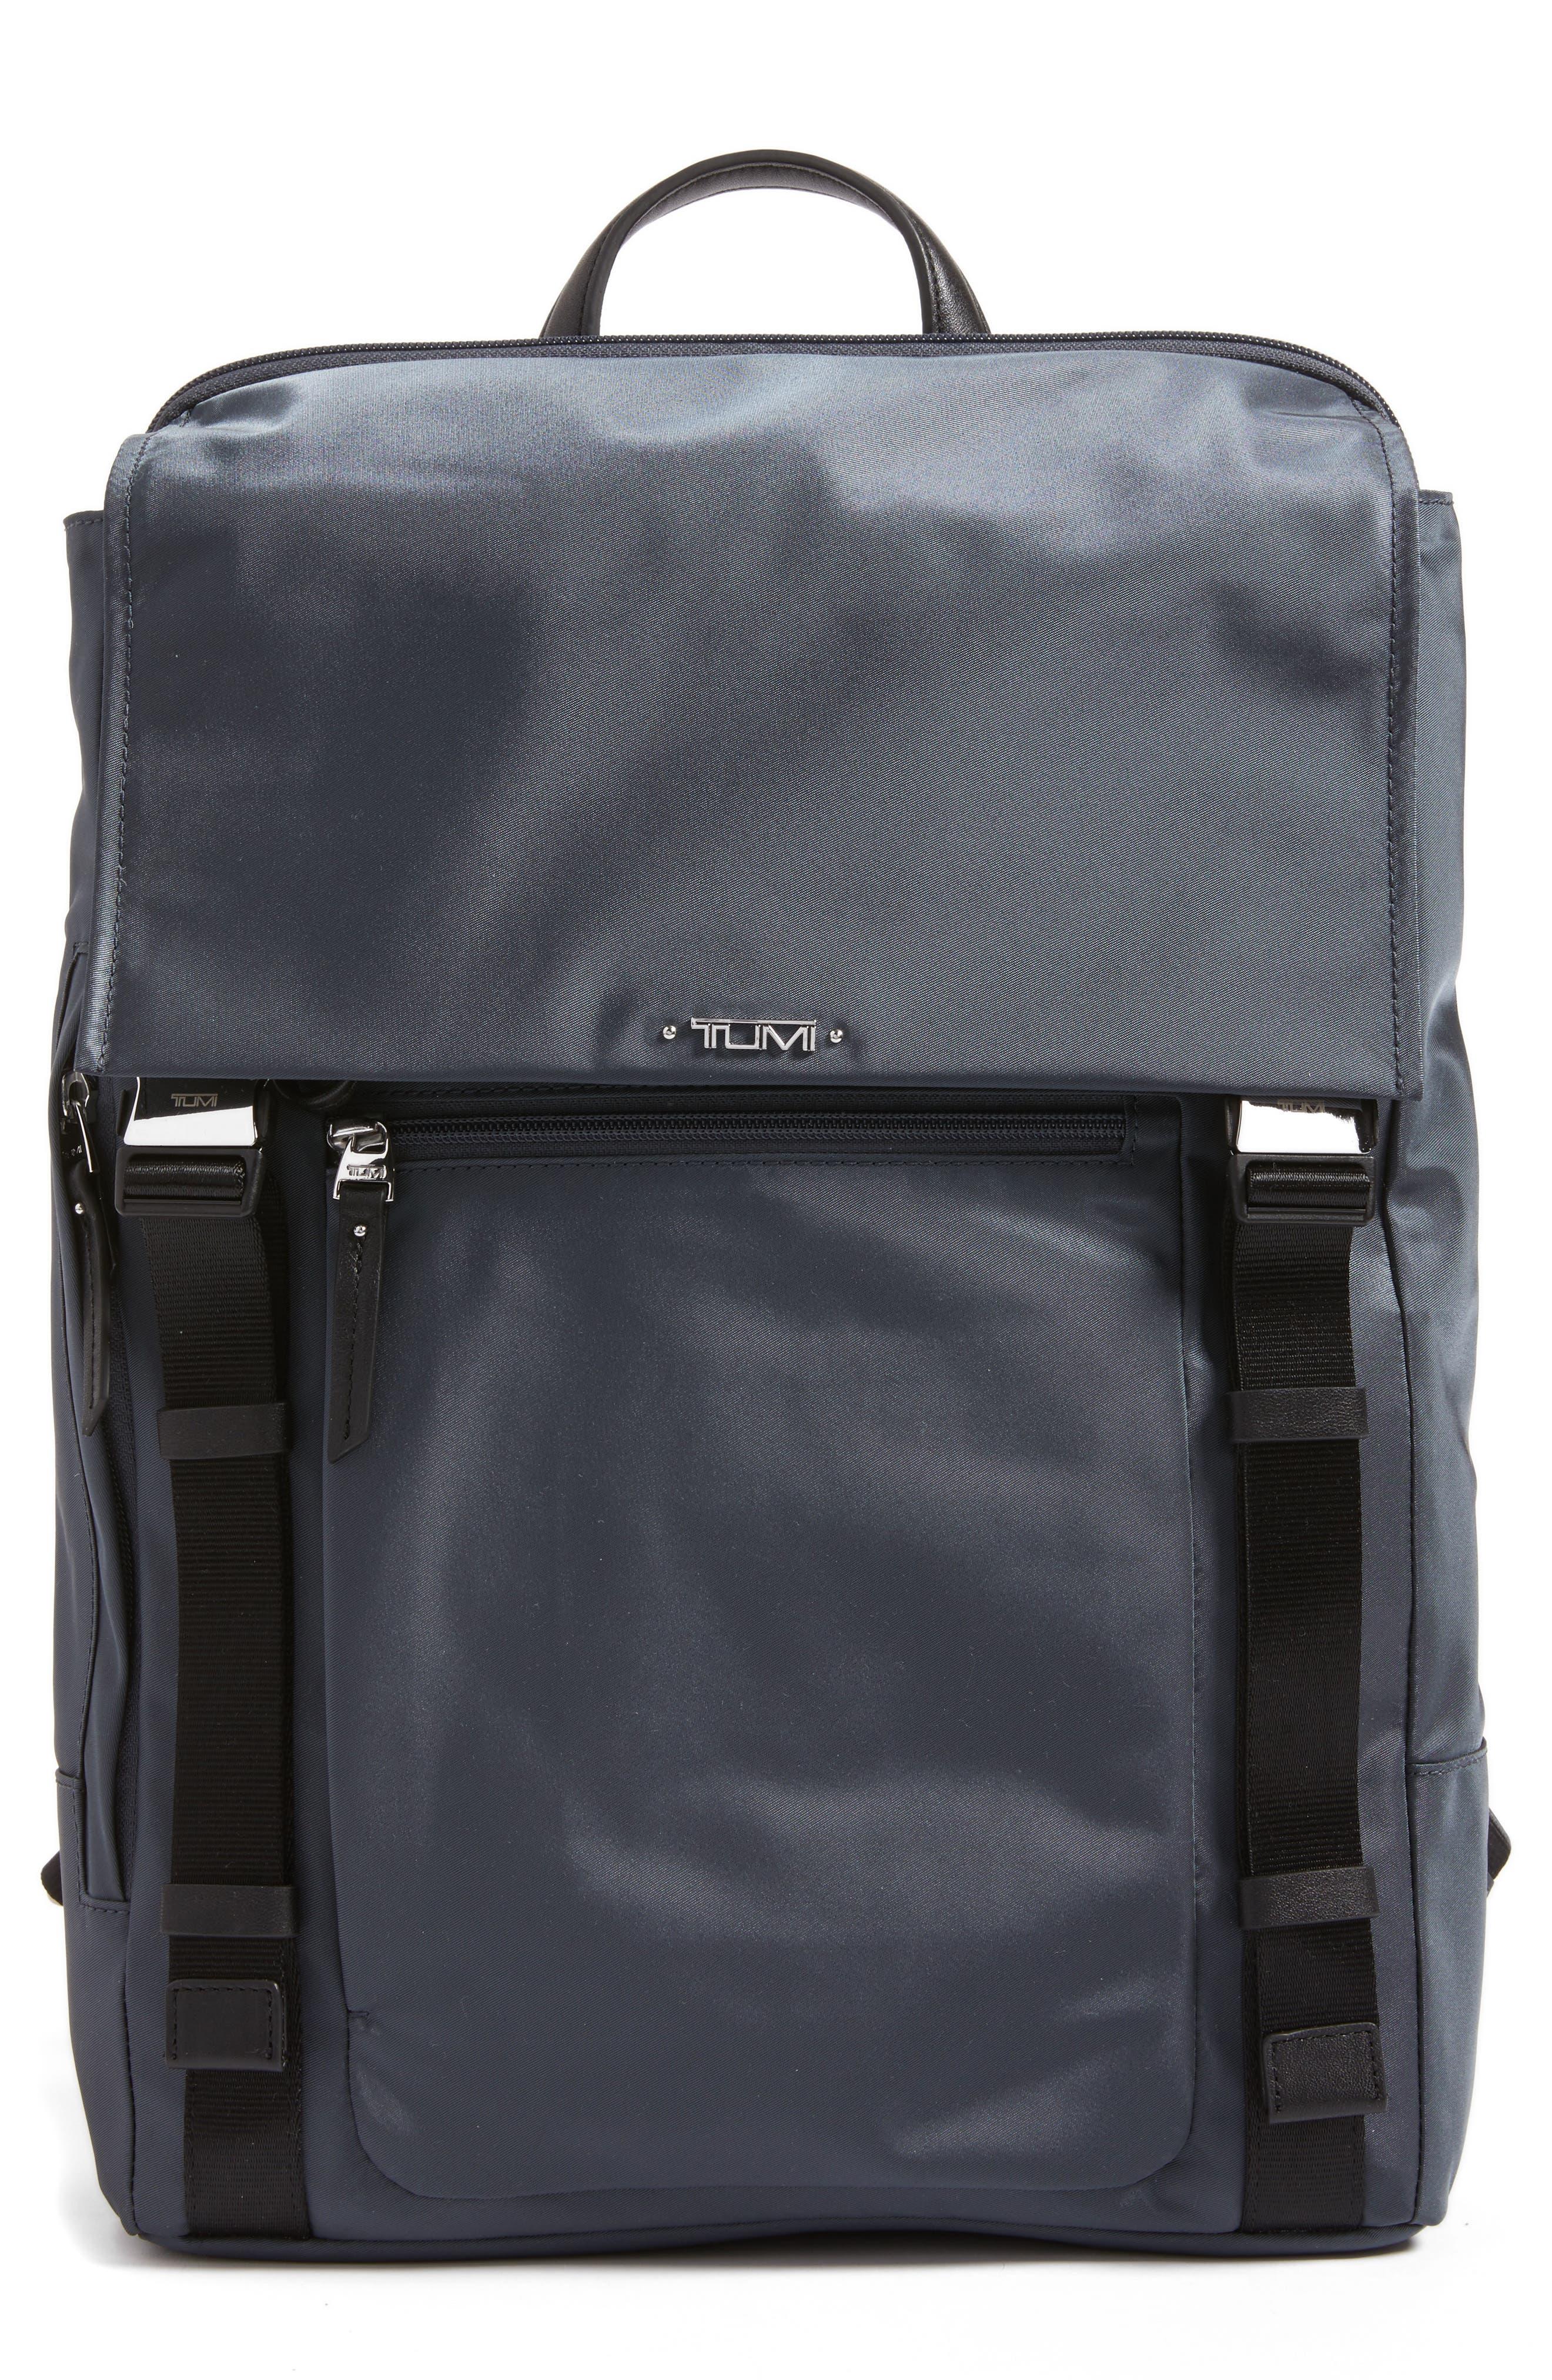 Tumi Voyageur Sacha Water Resistant Backpack